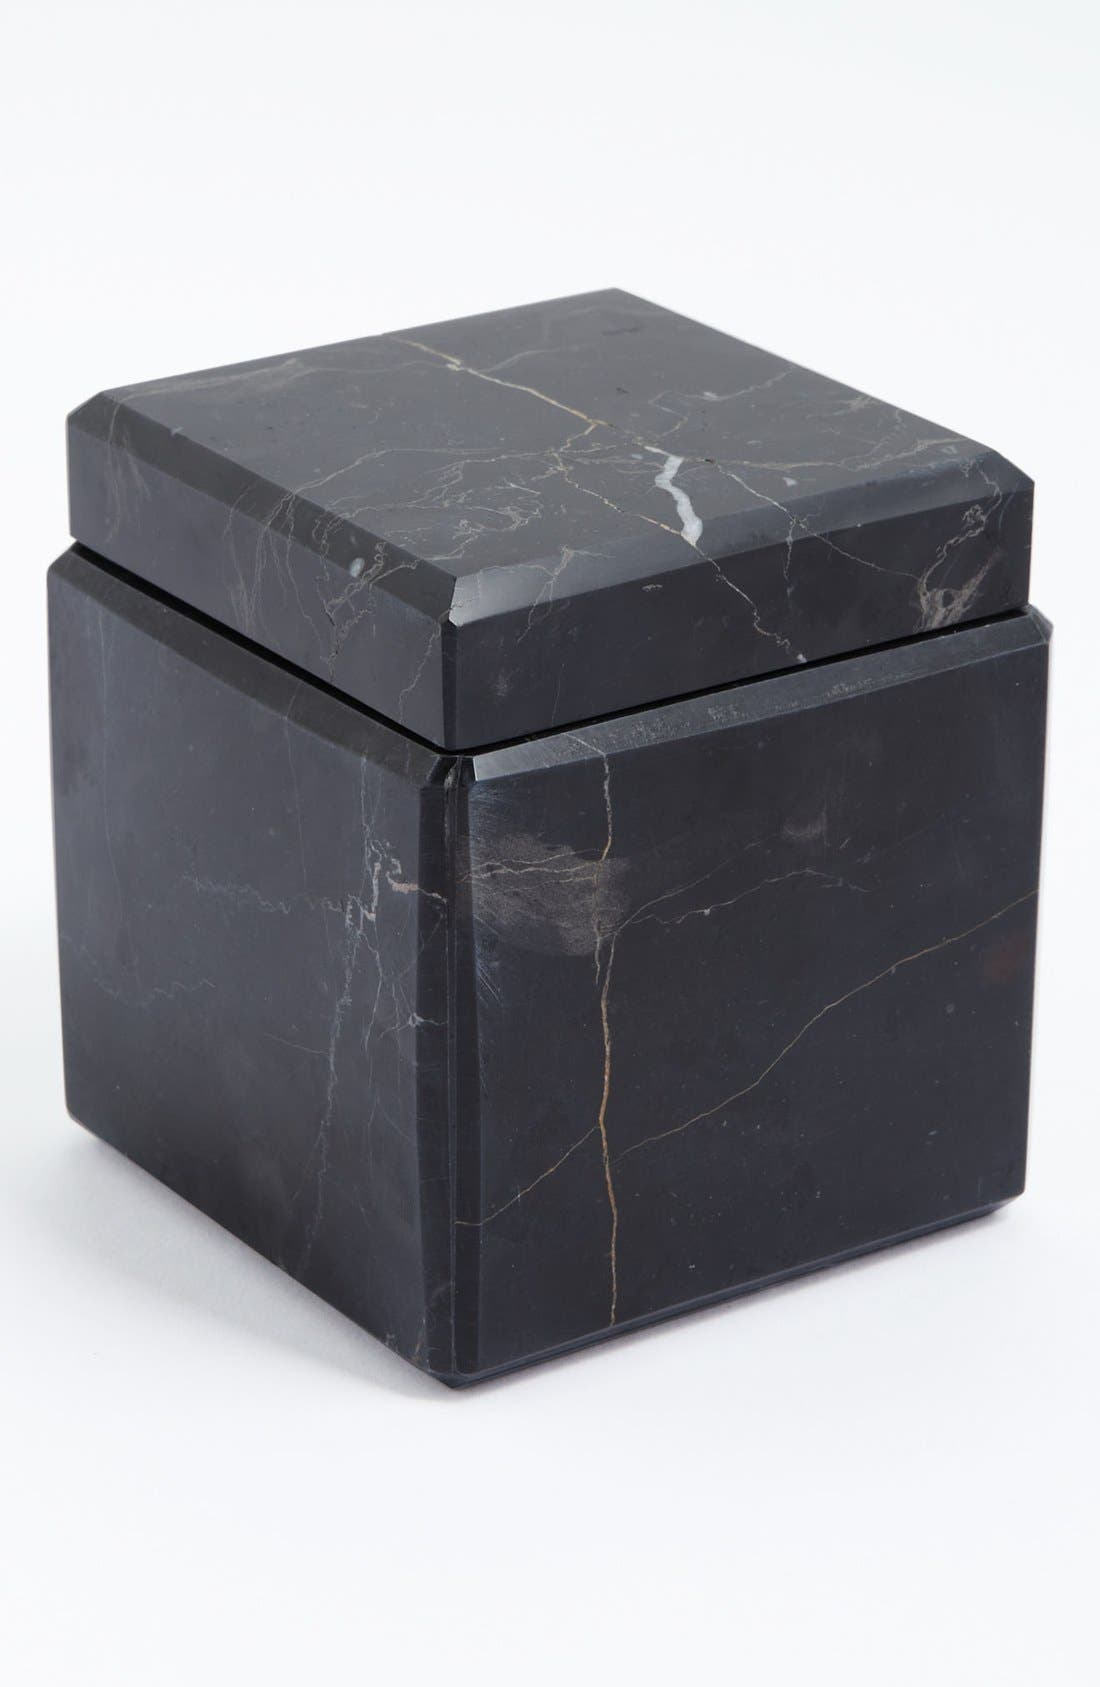 Alternate Image 1 Selected - Waterworks Studio 'Luna' Black Marble Covered Jar (Online Only)